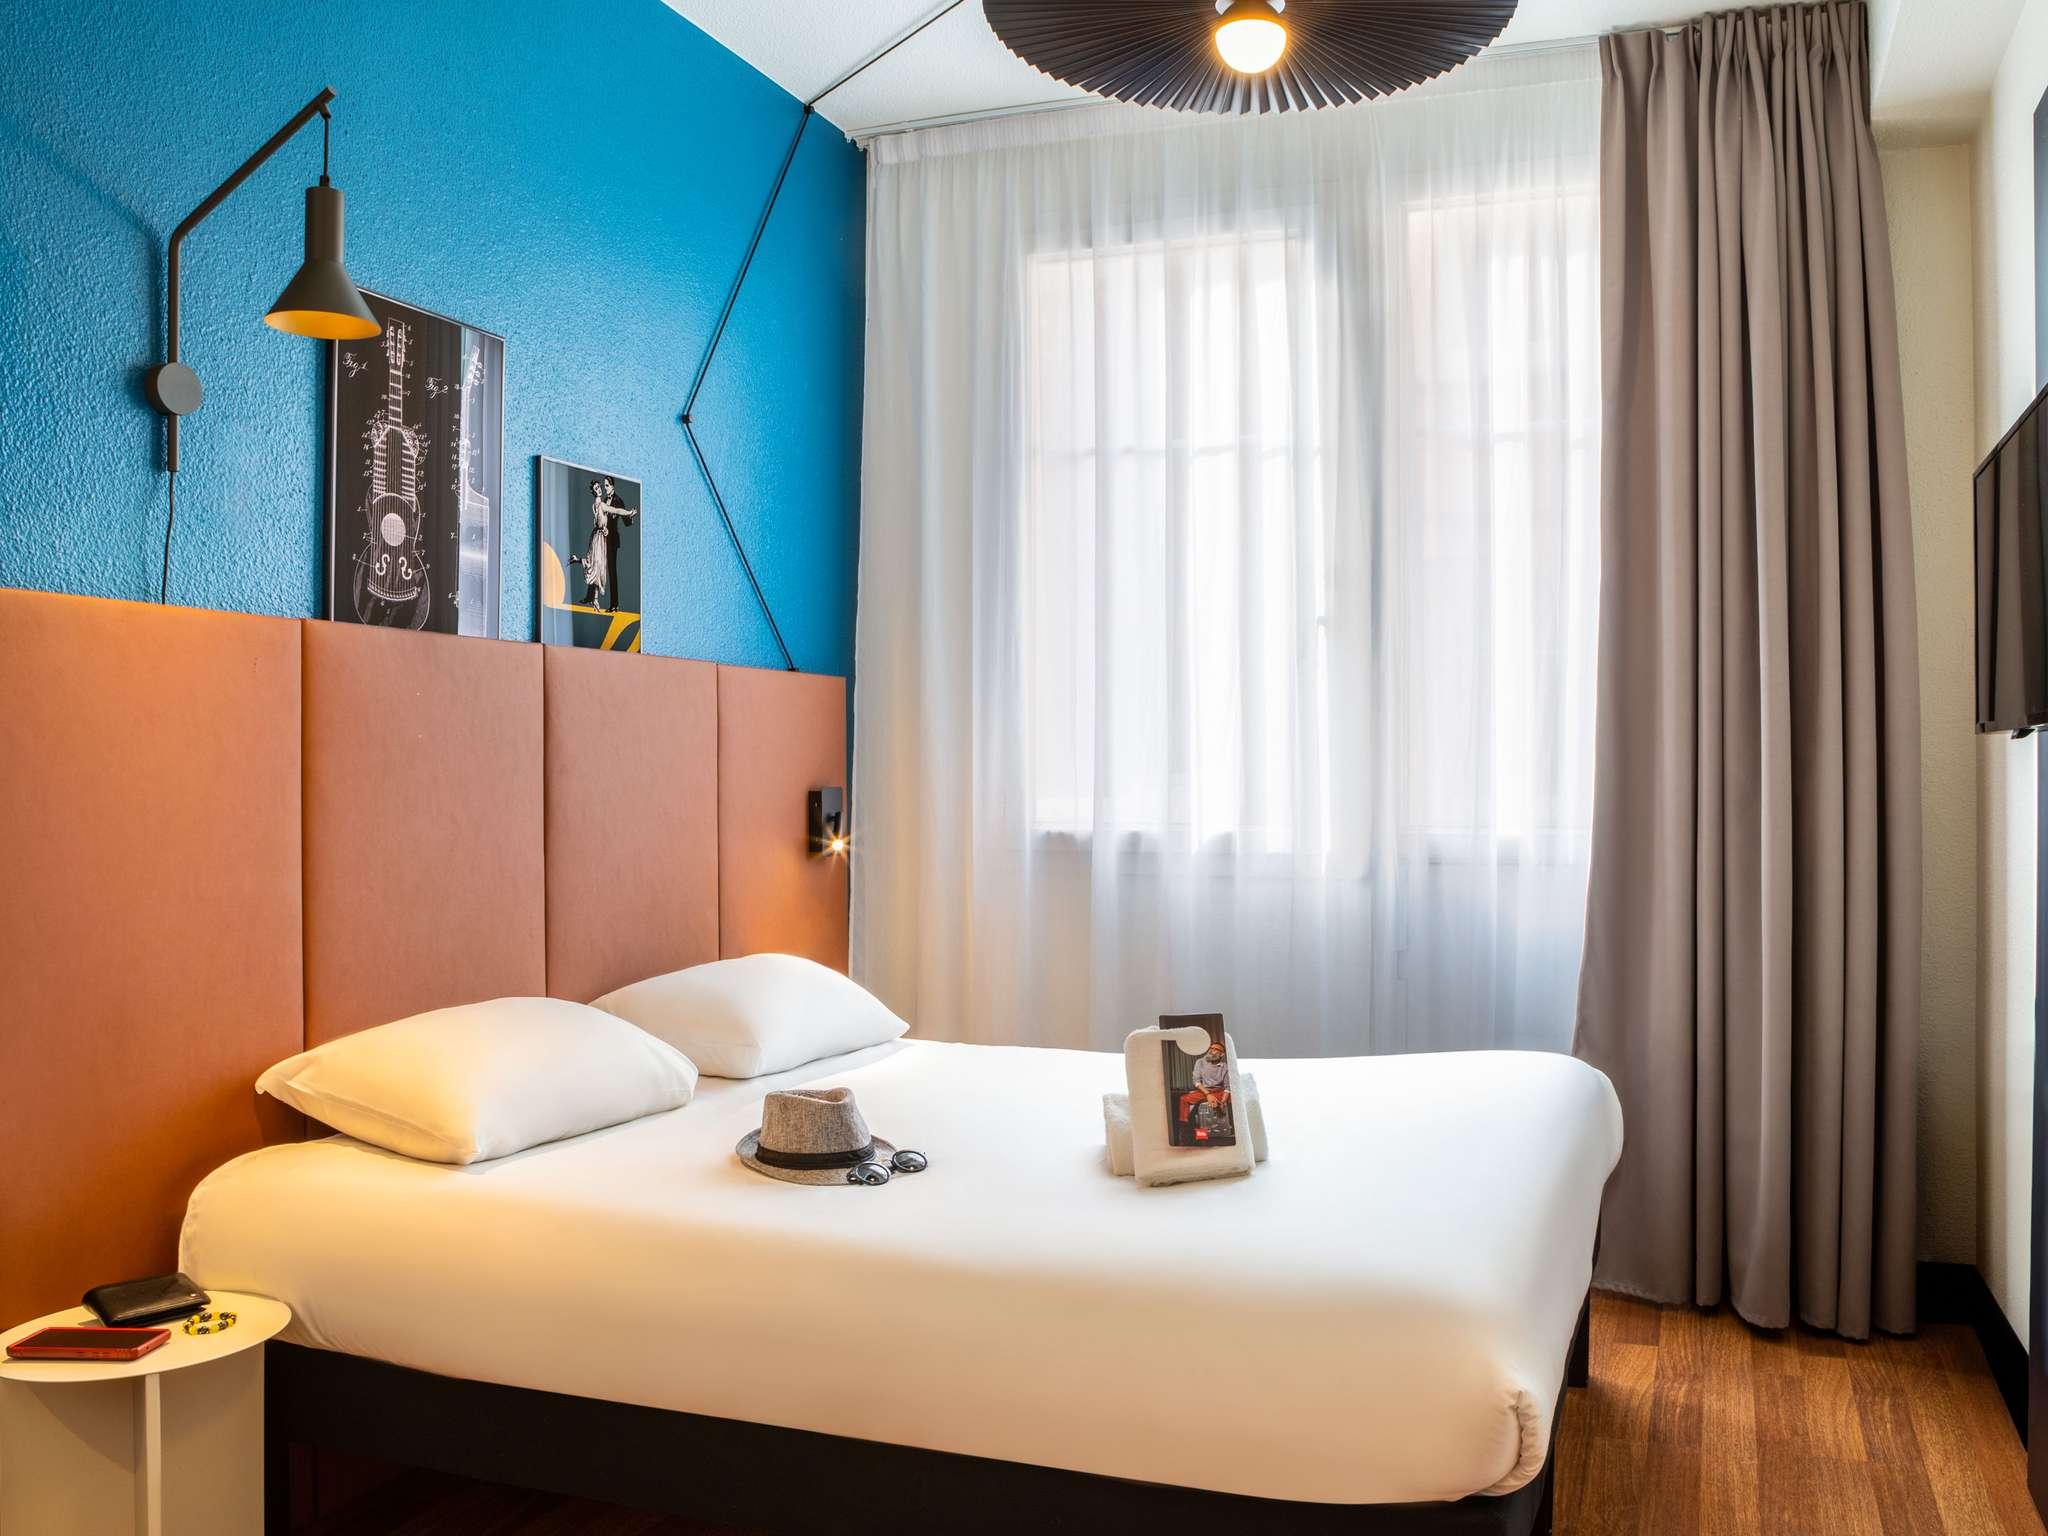 Otel – ibis Paris Ornano Montmartre Terminali 18. Bölge